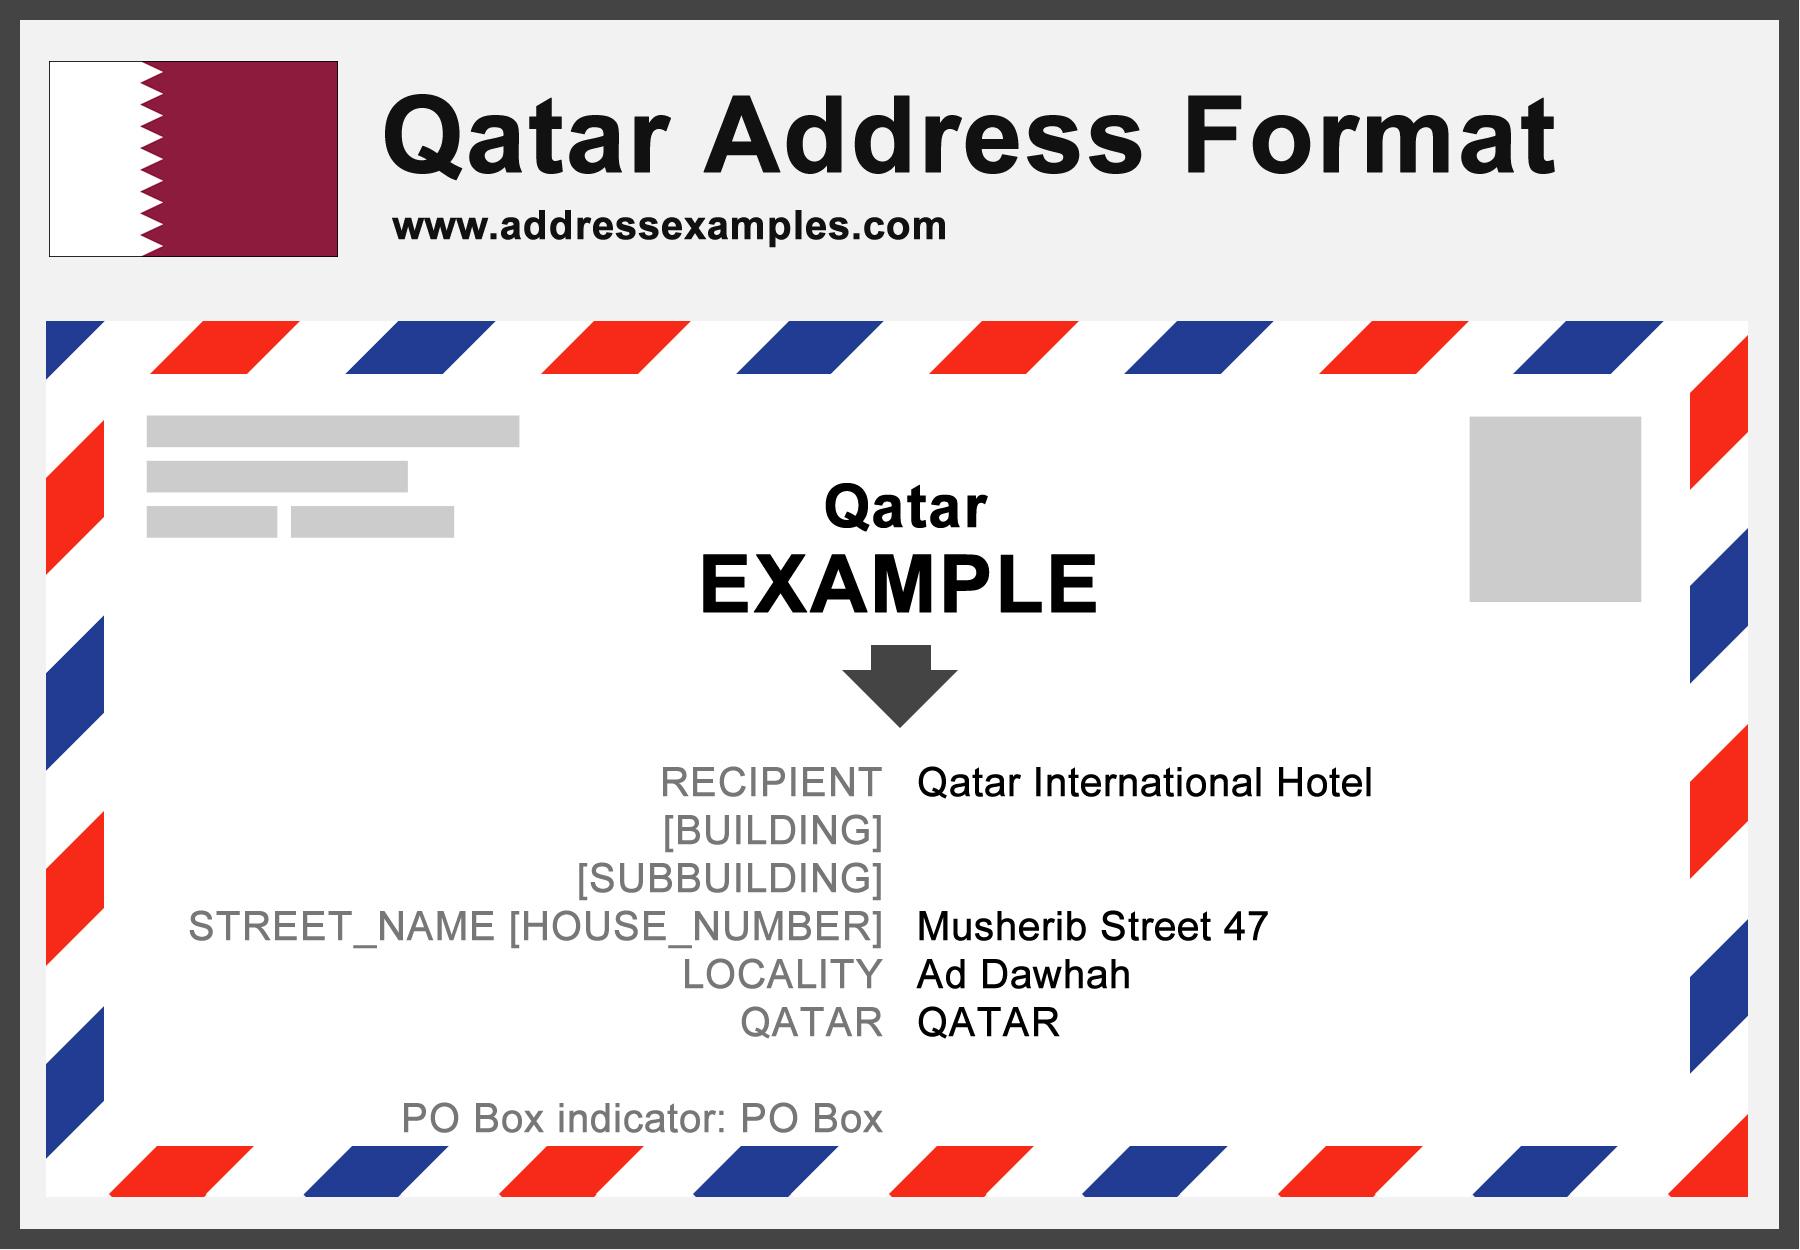 Qatar Address Format